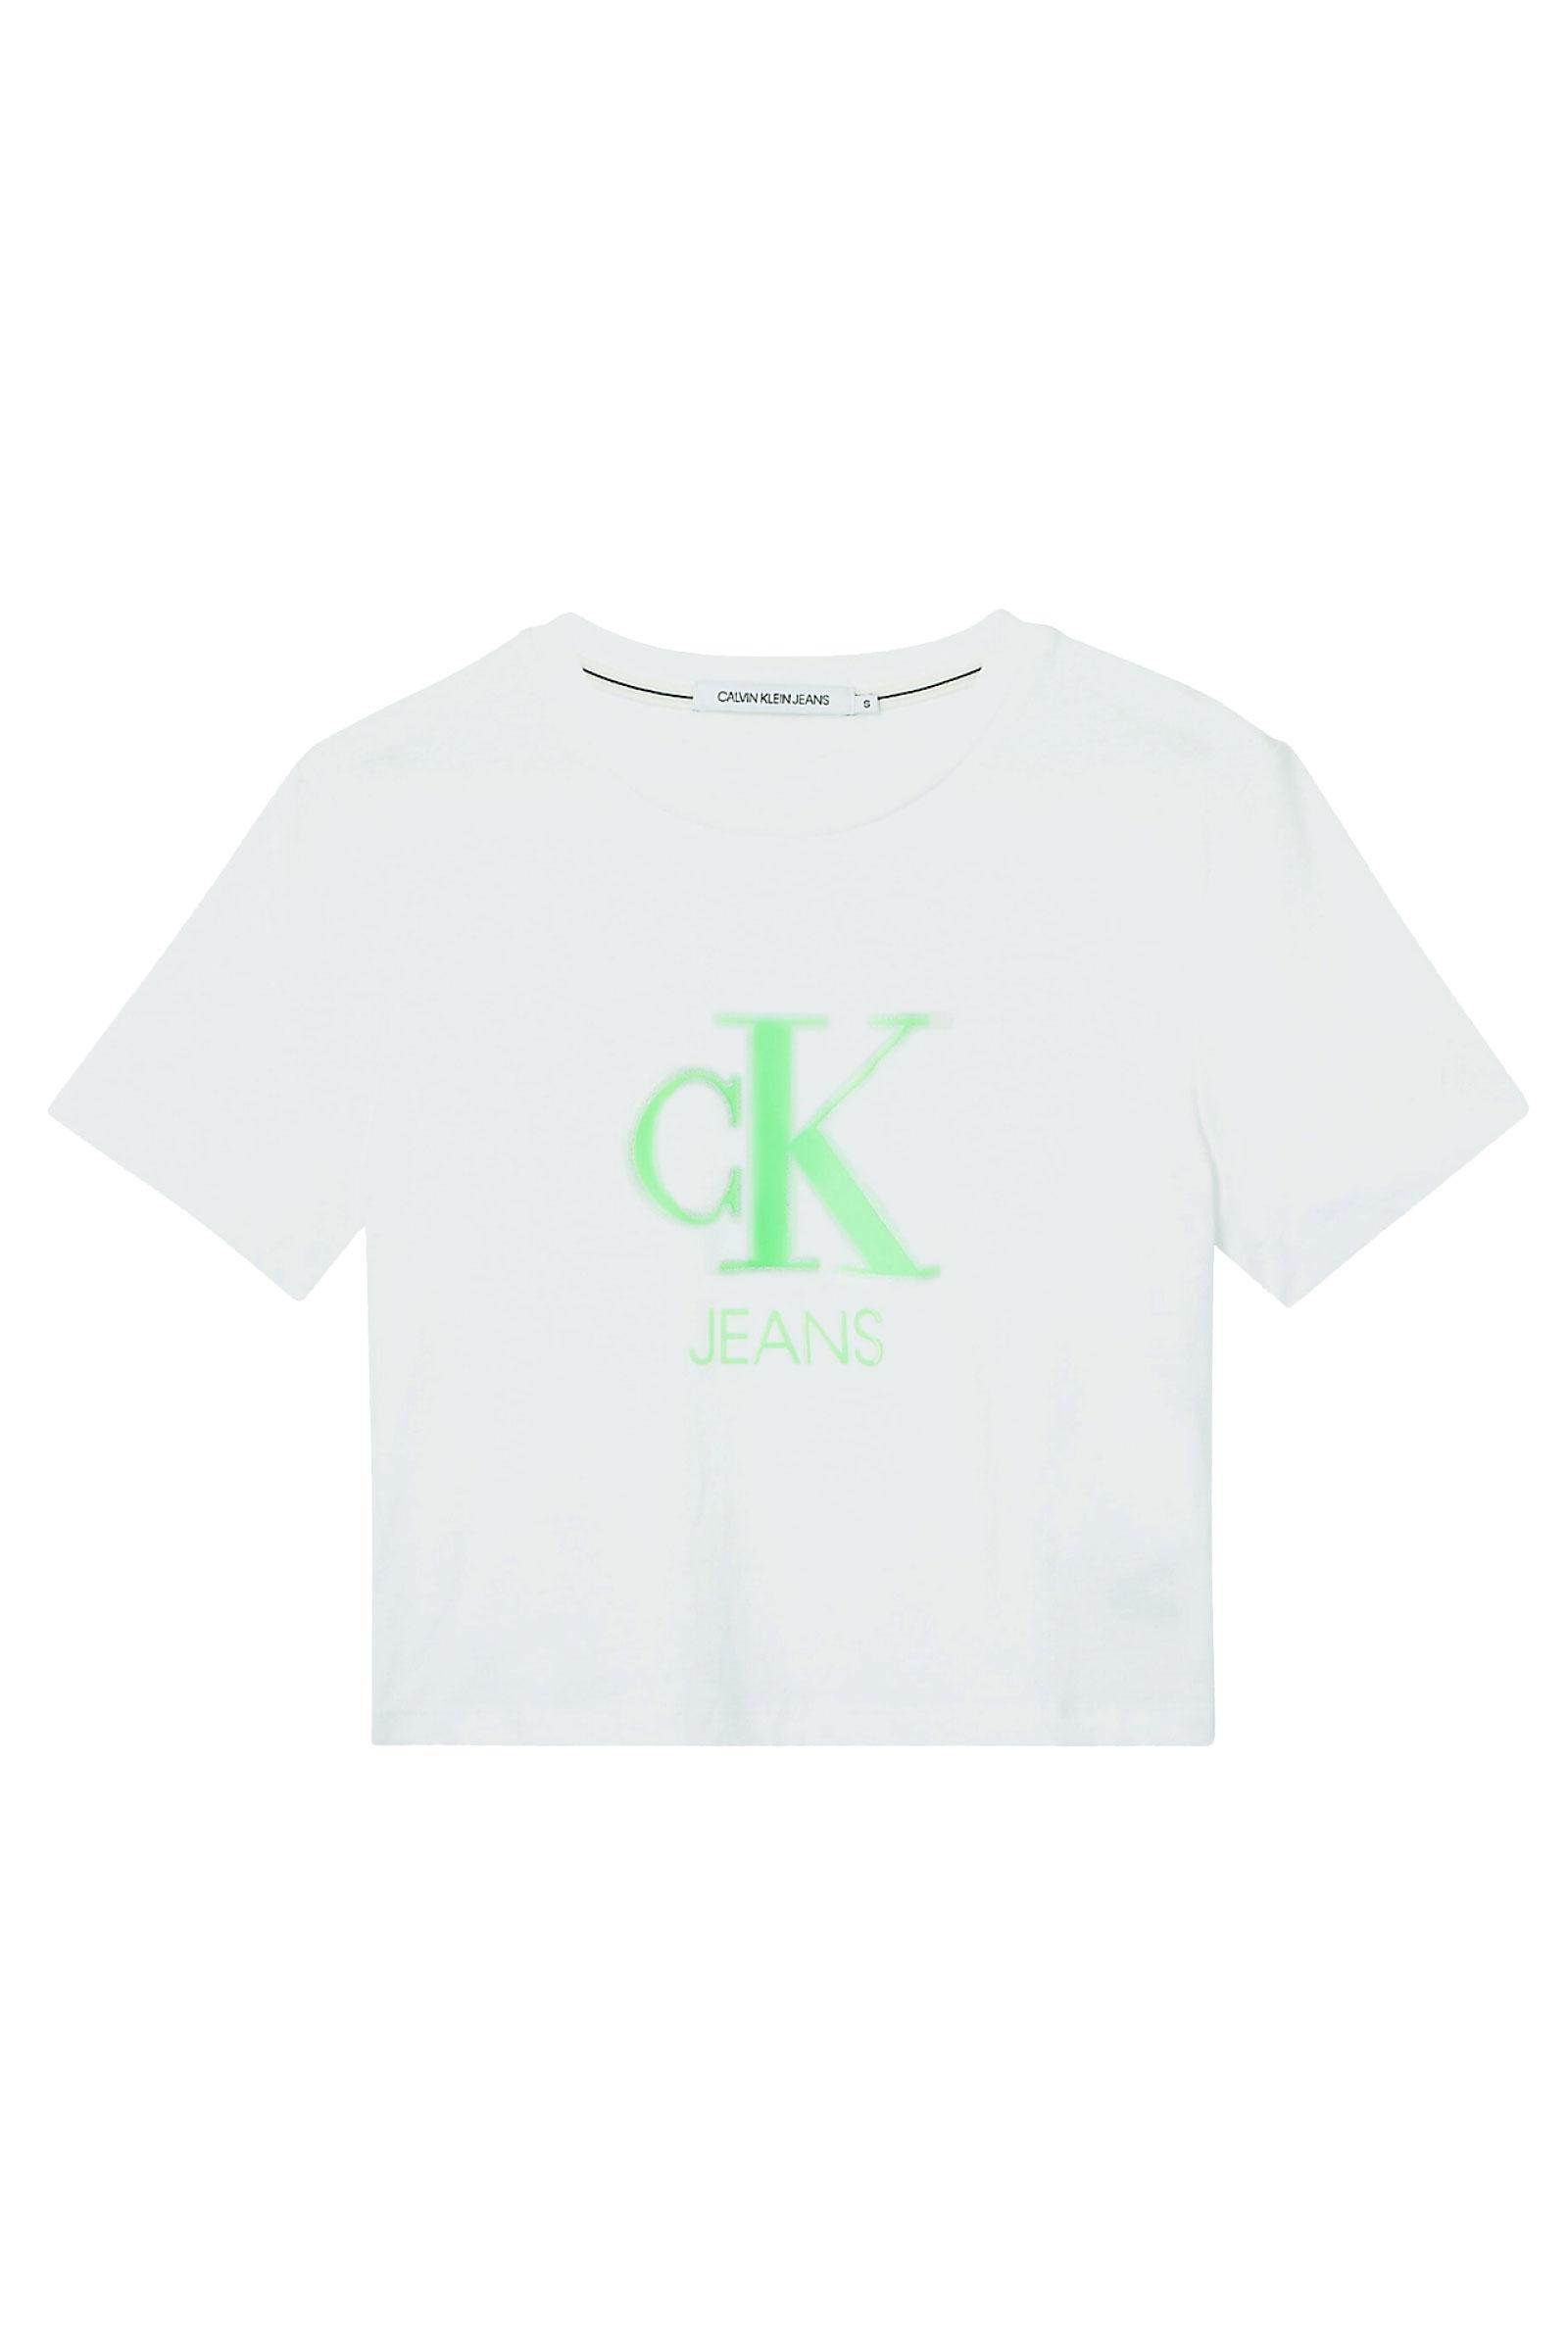 CALVIN KLEIN JEANS Women's T-Shirt CALVIN KLEIN JEANS | T-Shirt | J20J215312YAF